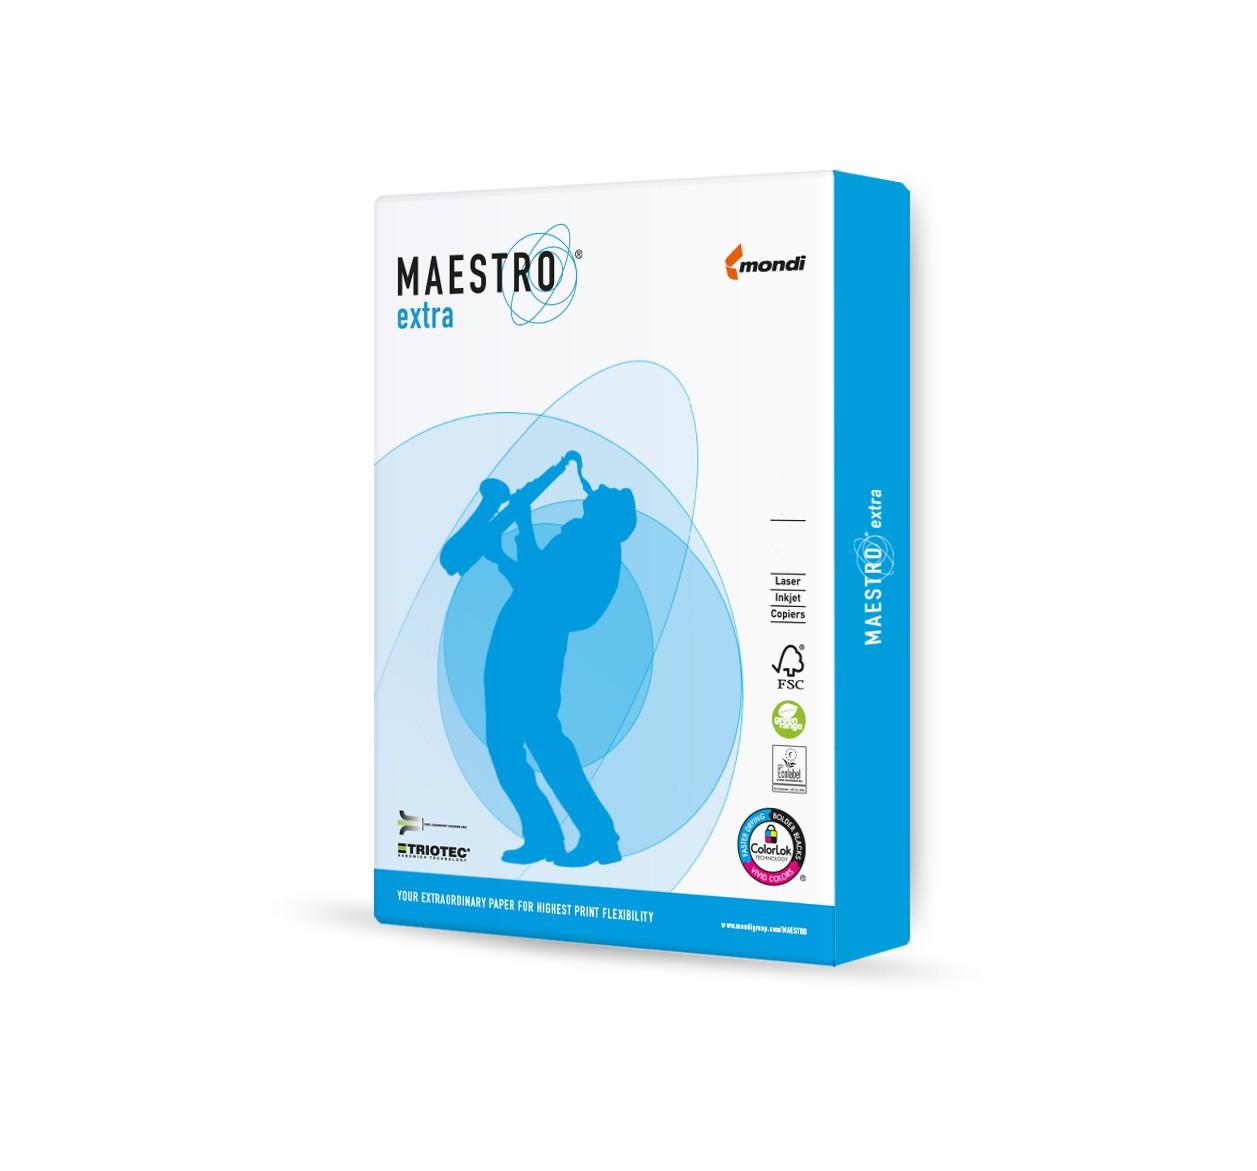 Maestro Extra 160g/m² Papier 250 Blatt DIN-A3 weiß